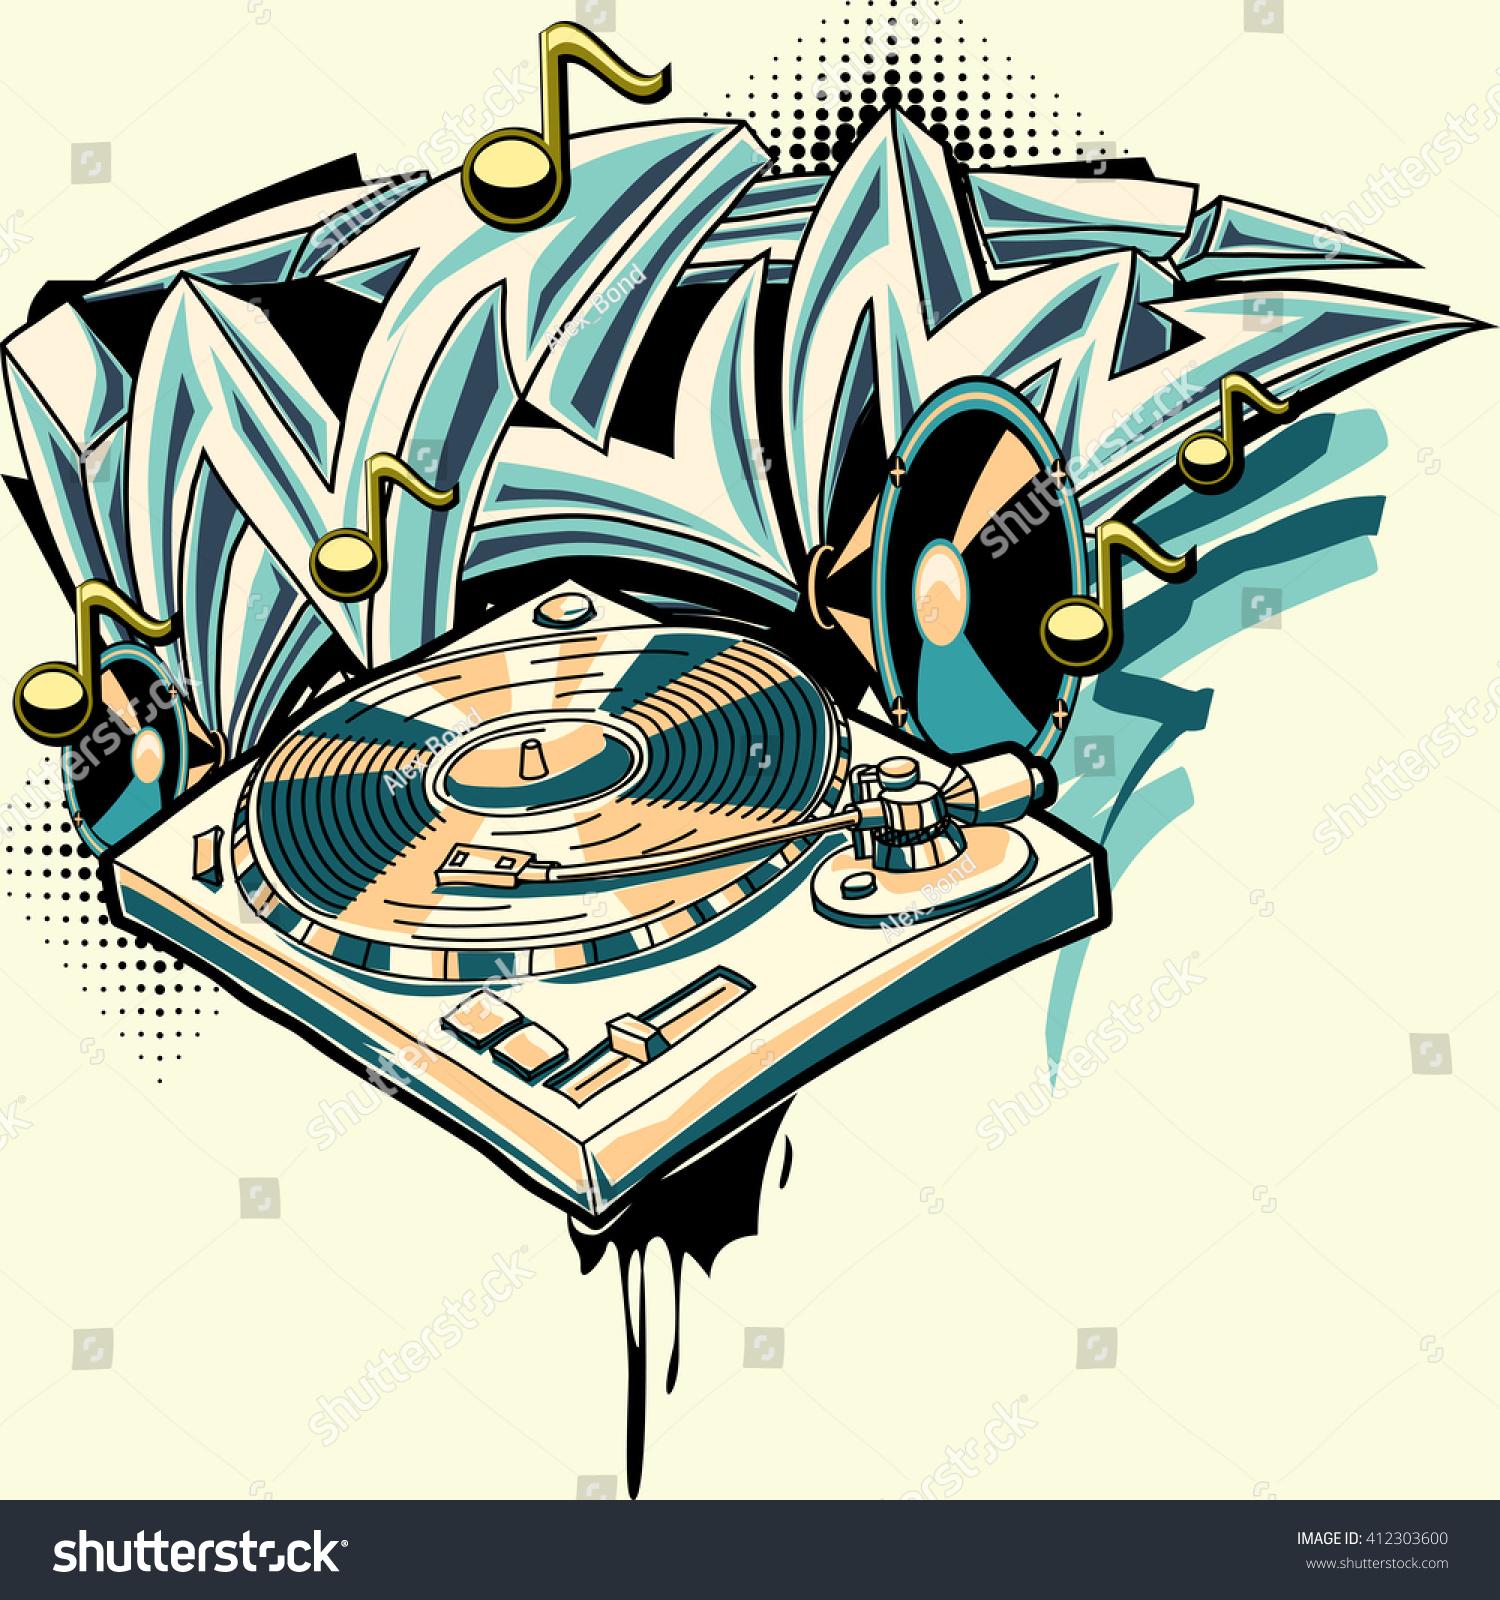 Music design turntable and graffiti arrows